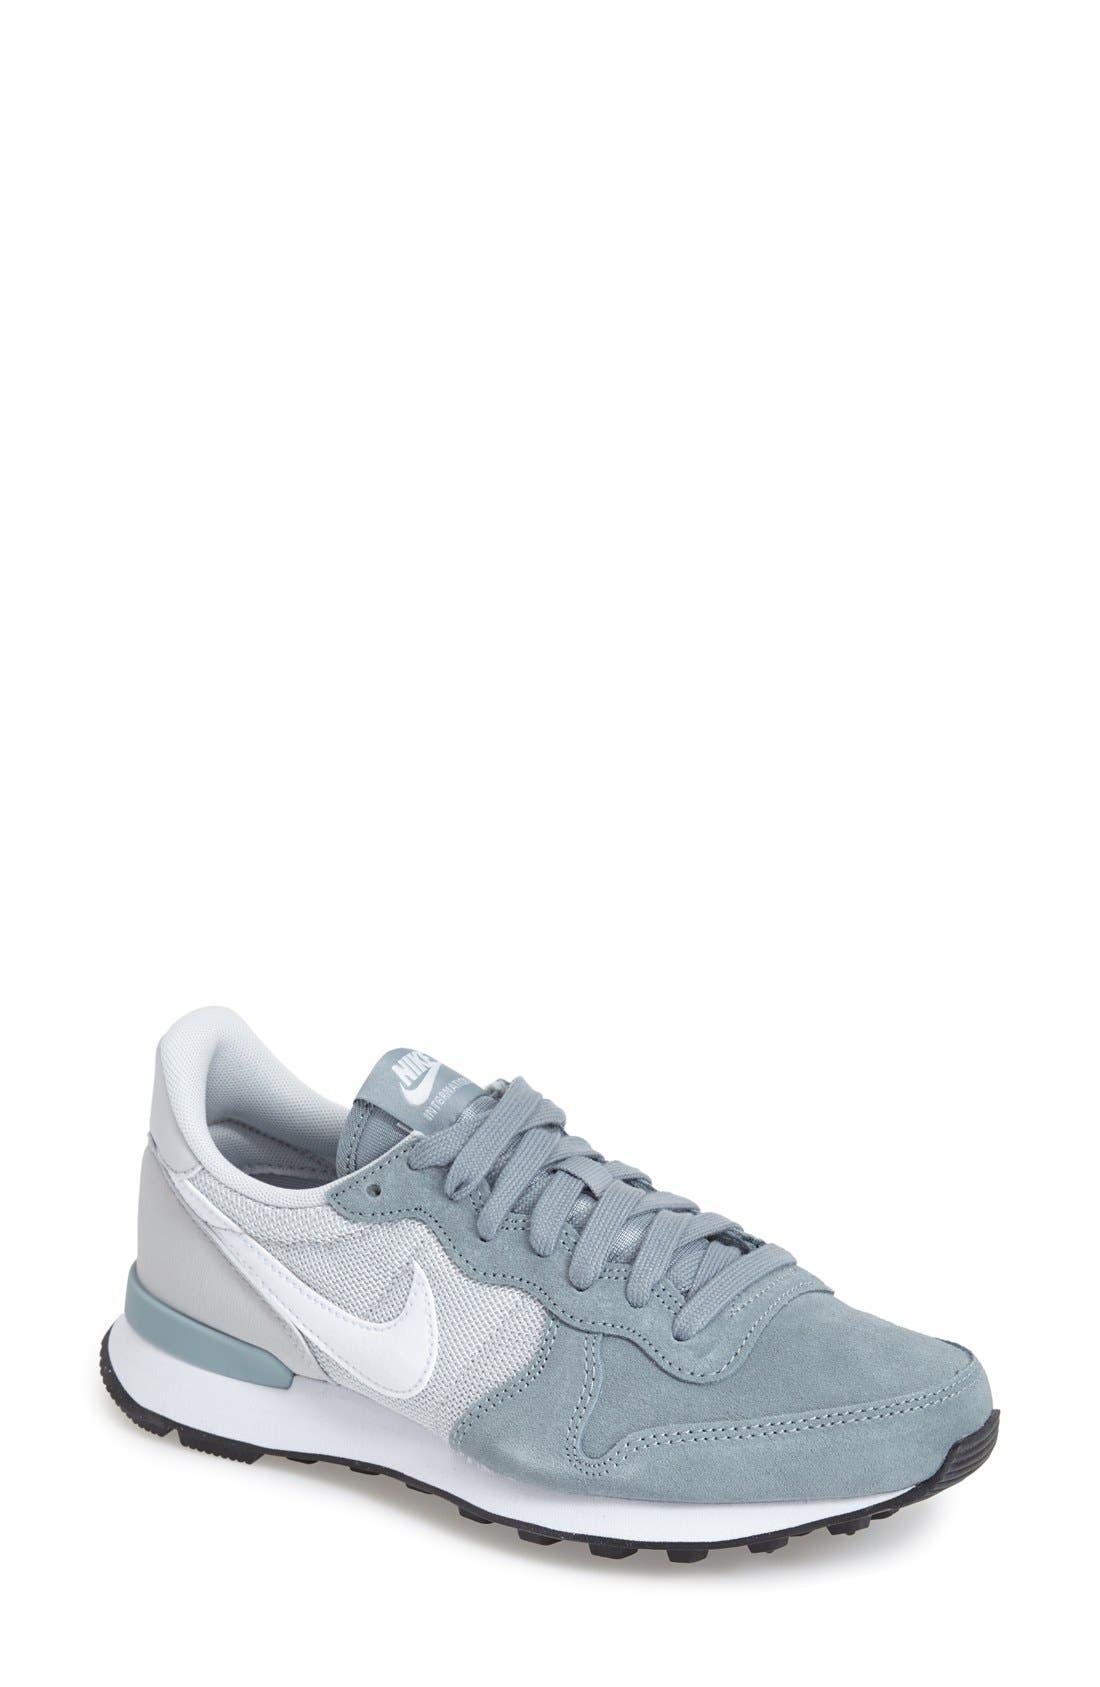 'Internationalist' Sneaker,                         Main,                         color, Grey/ Platinum/ Black